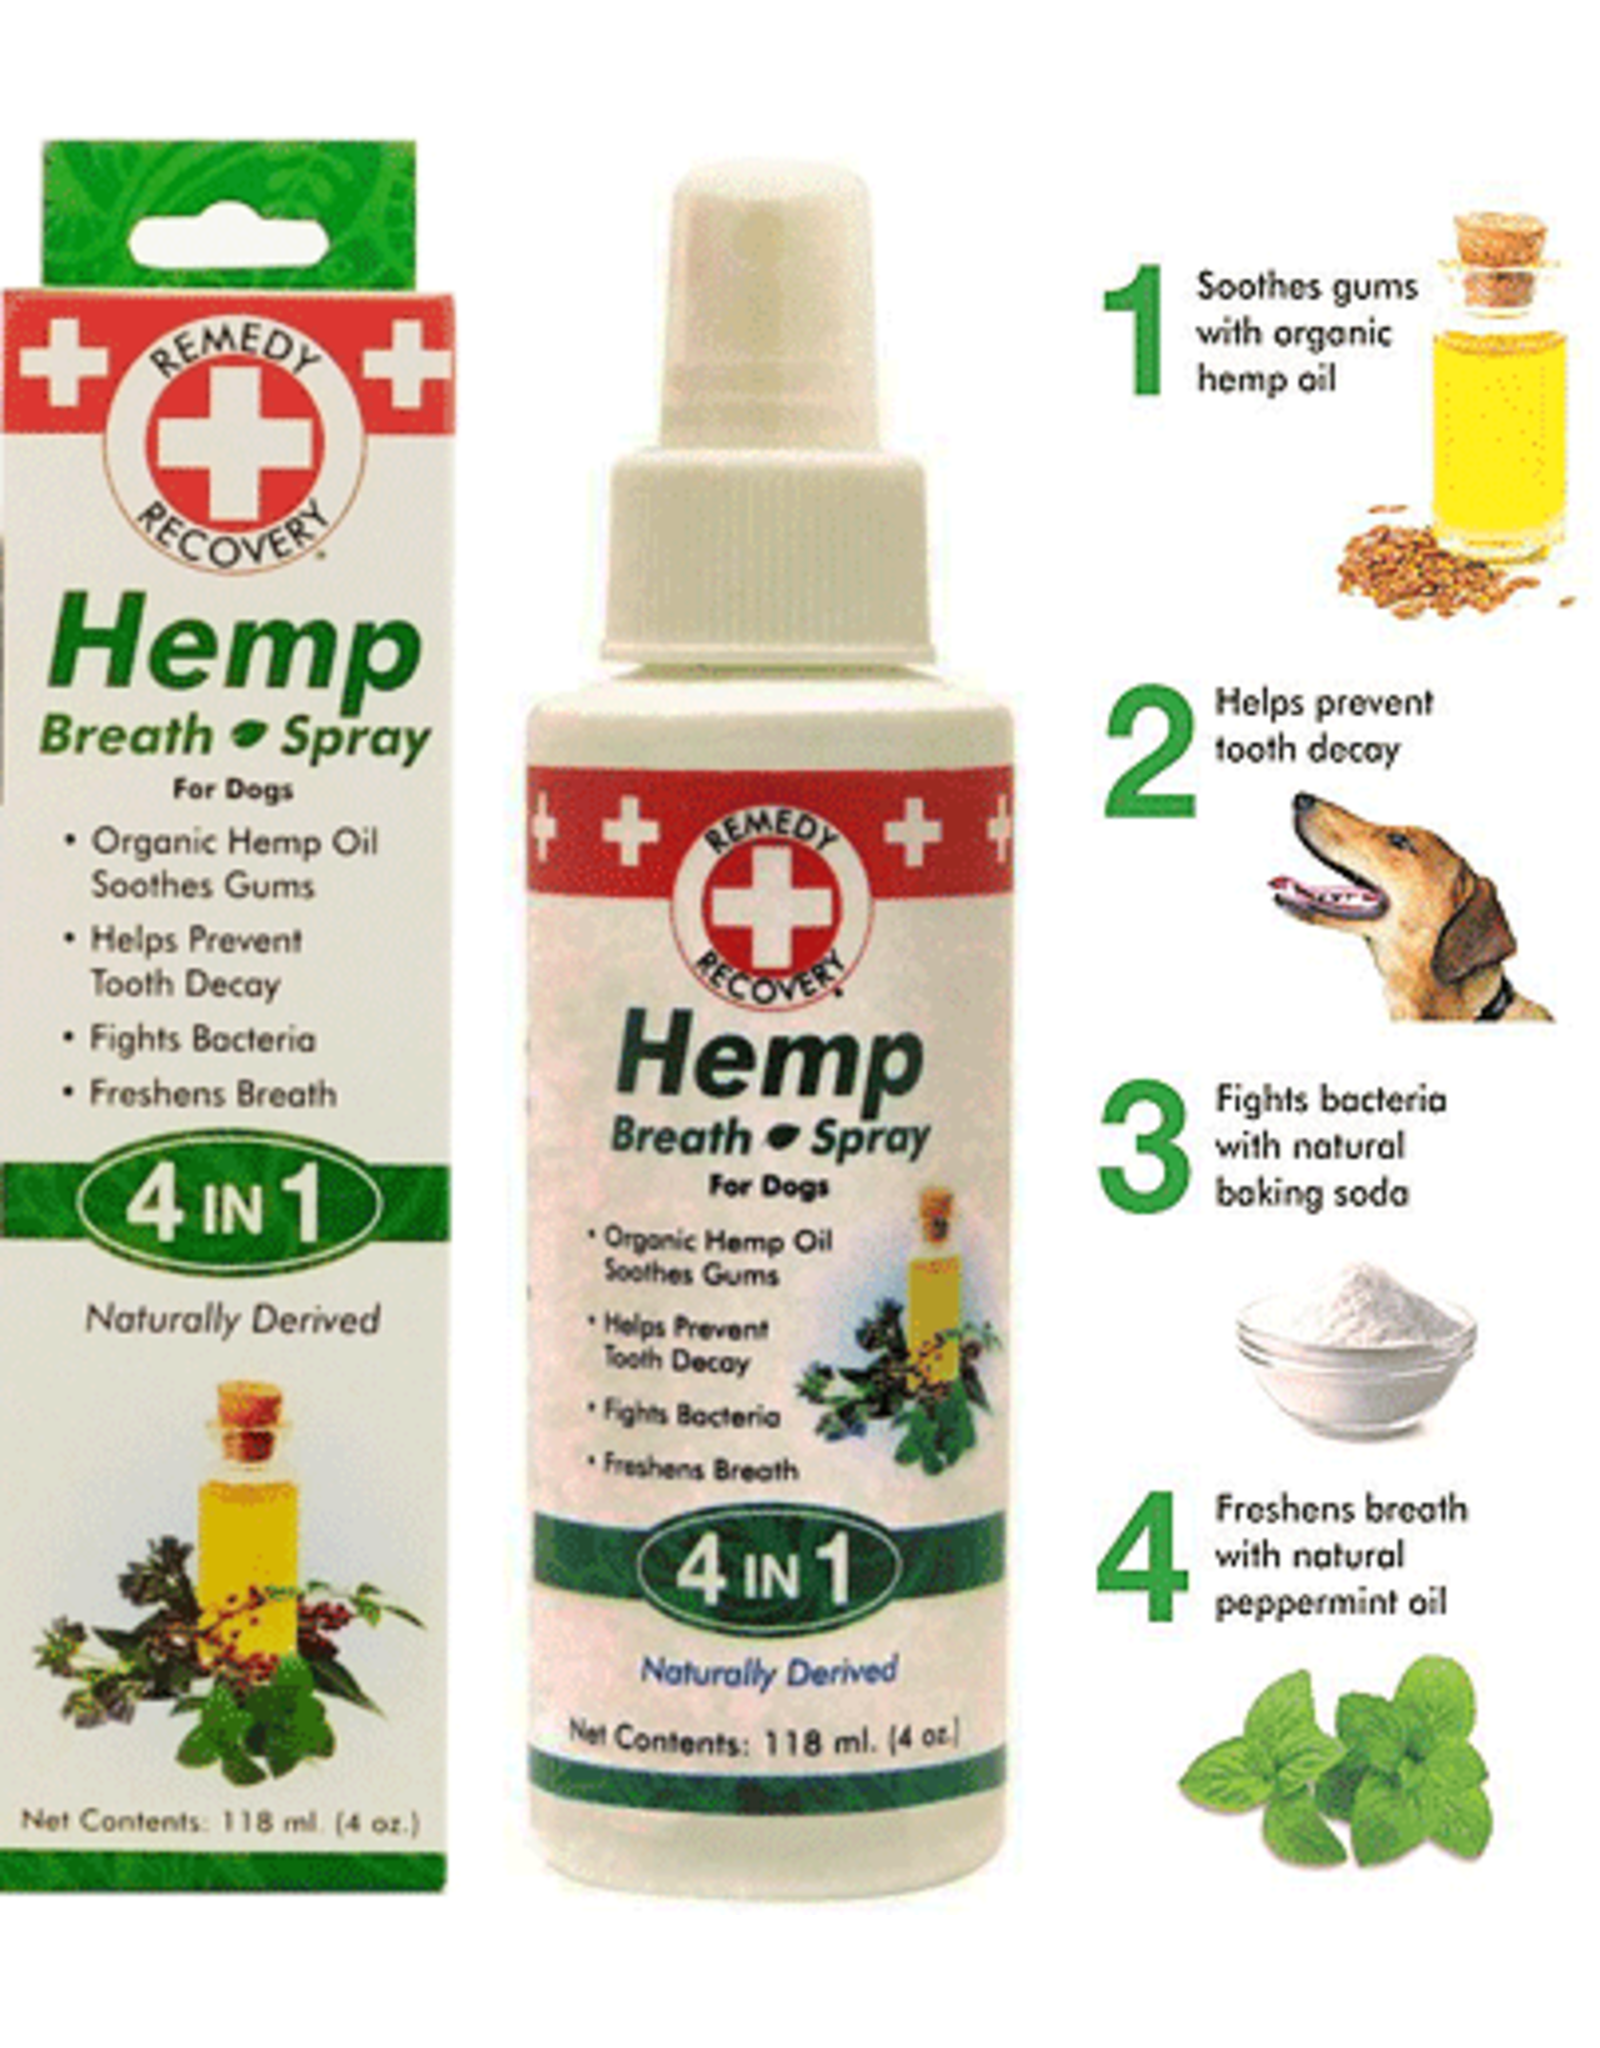 Cardinal Pet CARDINAL 4-in-1 Hemp Breath Spray